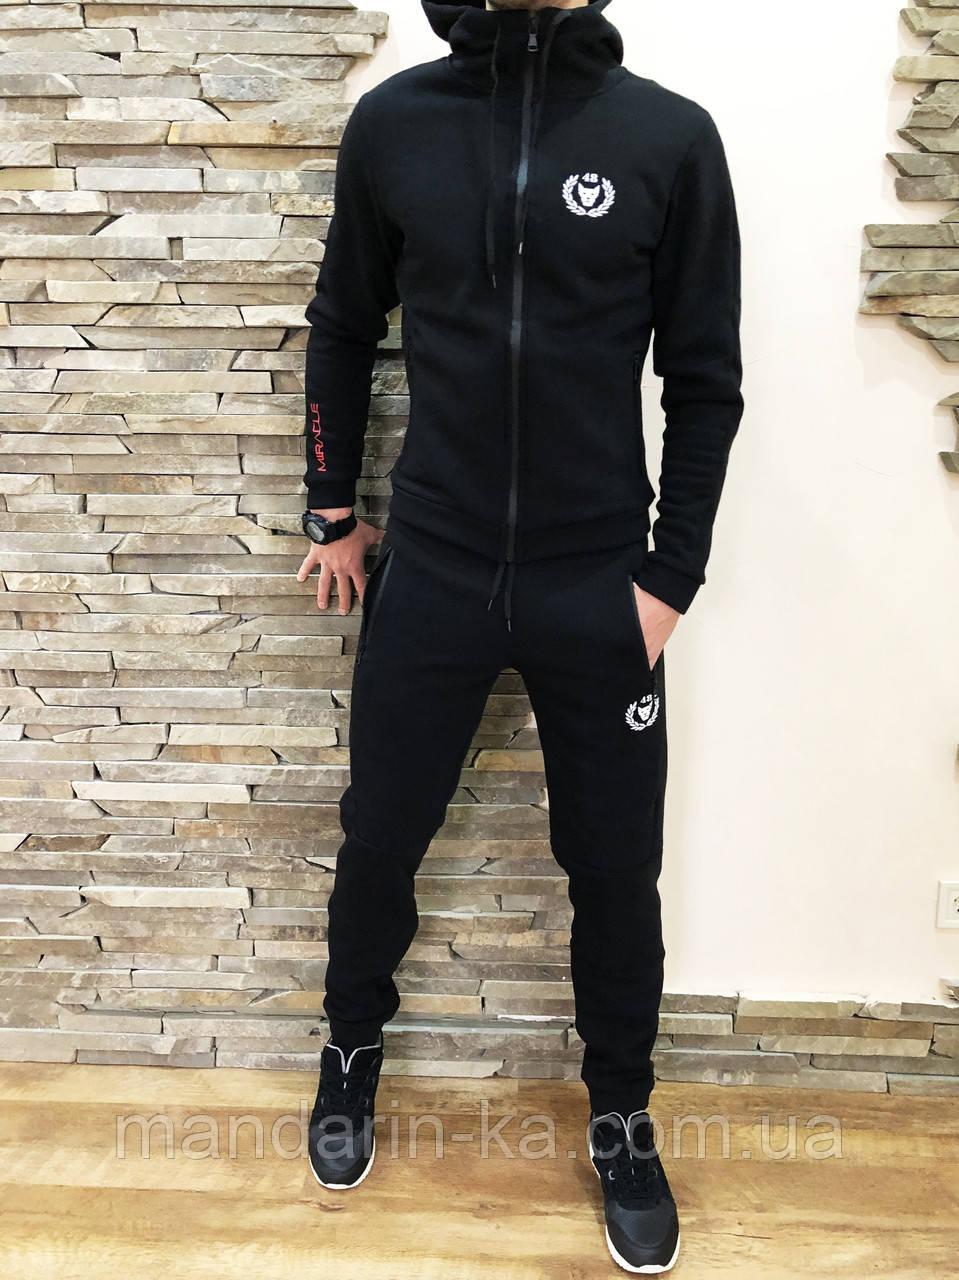 Мужской утепленный спортивный  костюм  Miracle олимпийка  штаны